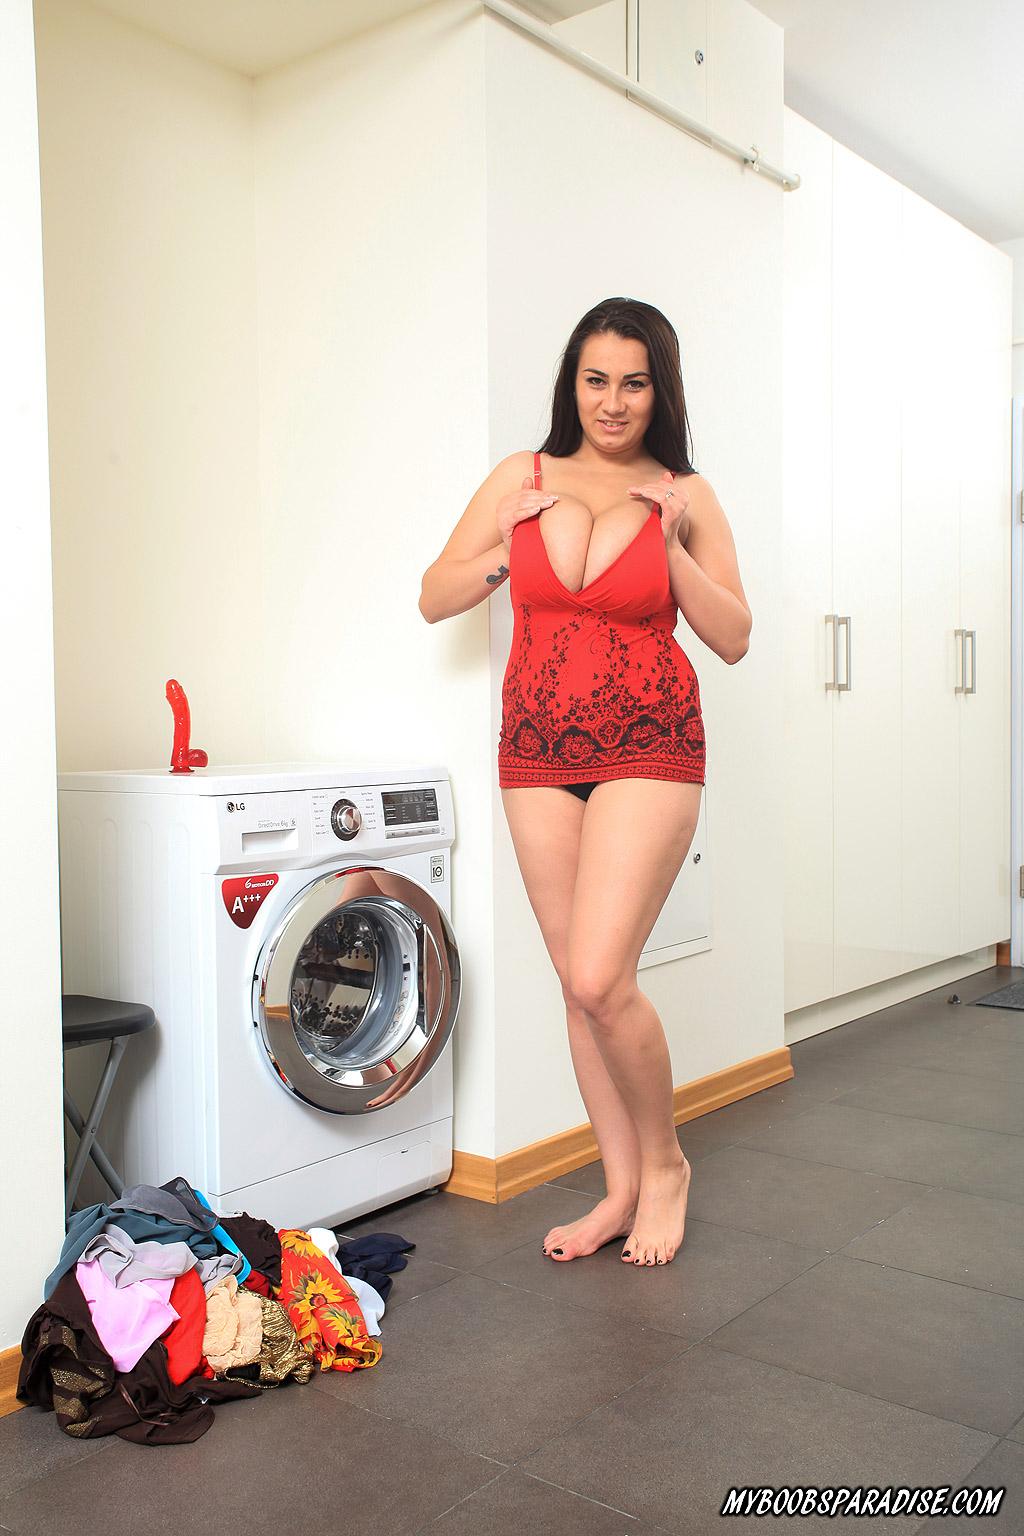 PHOTO | 1 1 - Helen Star Nude Laundry Day